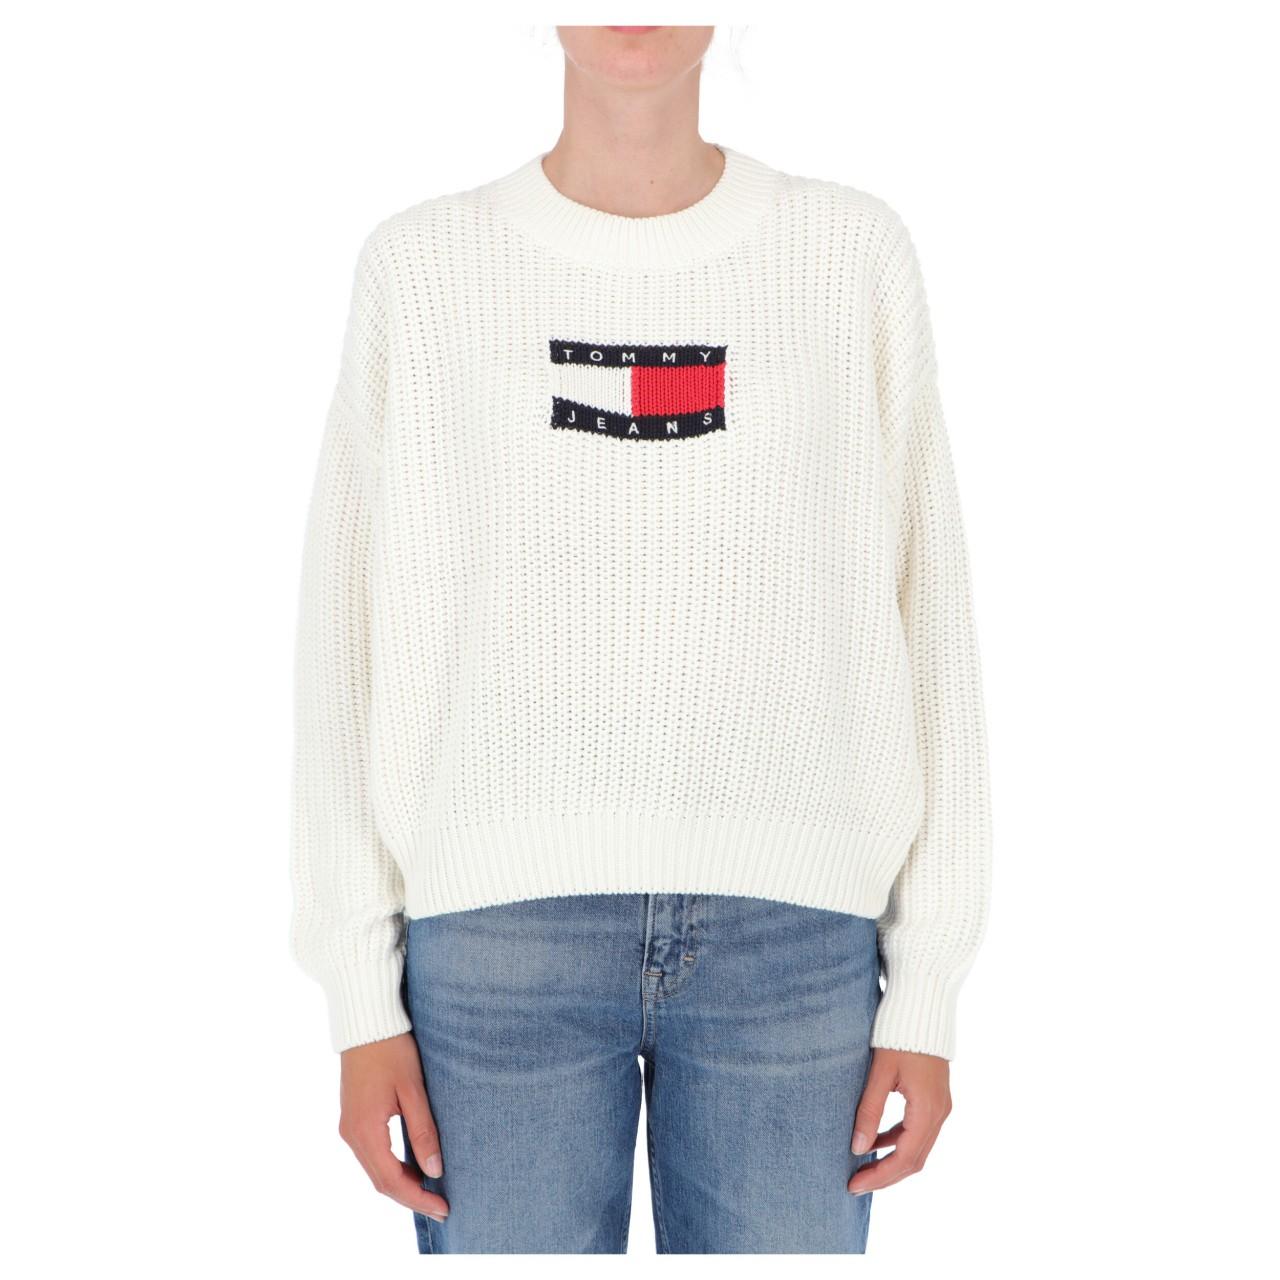 Tommy hilfiger Donna Maglia Tommy Hilfiger Jeans Donna Center Flag Sweater 11001Q